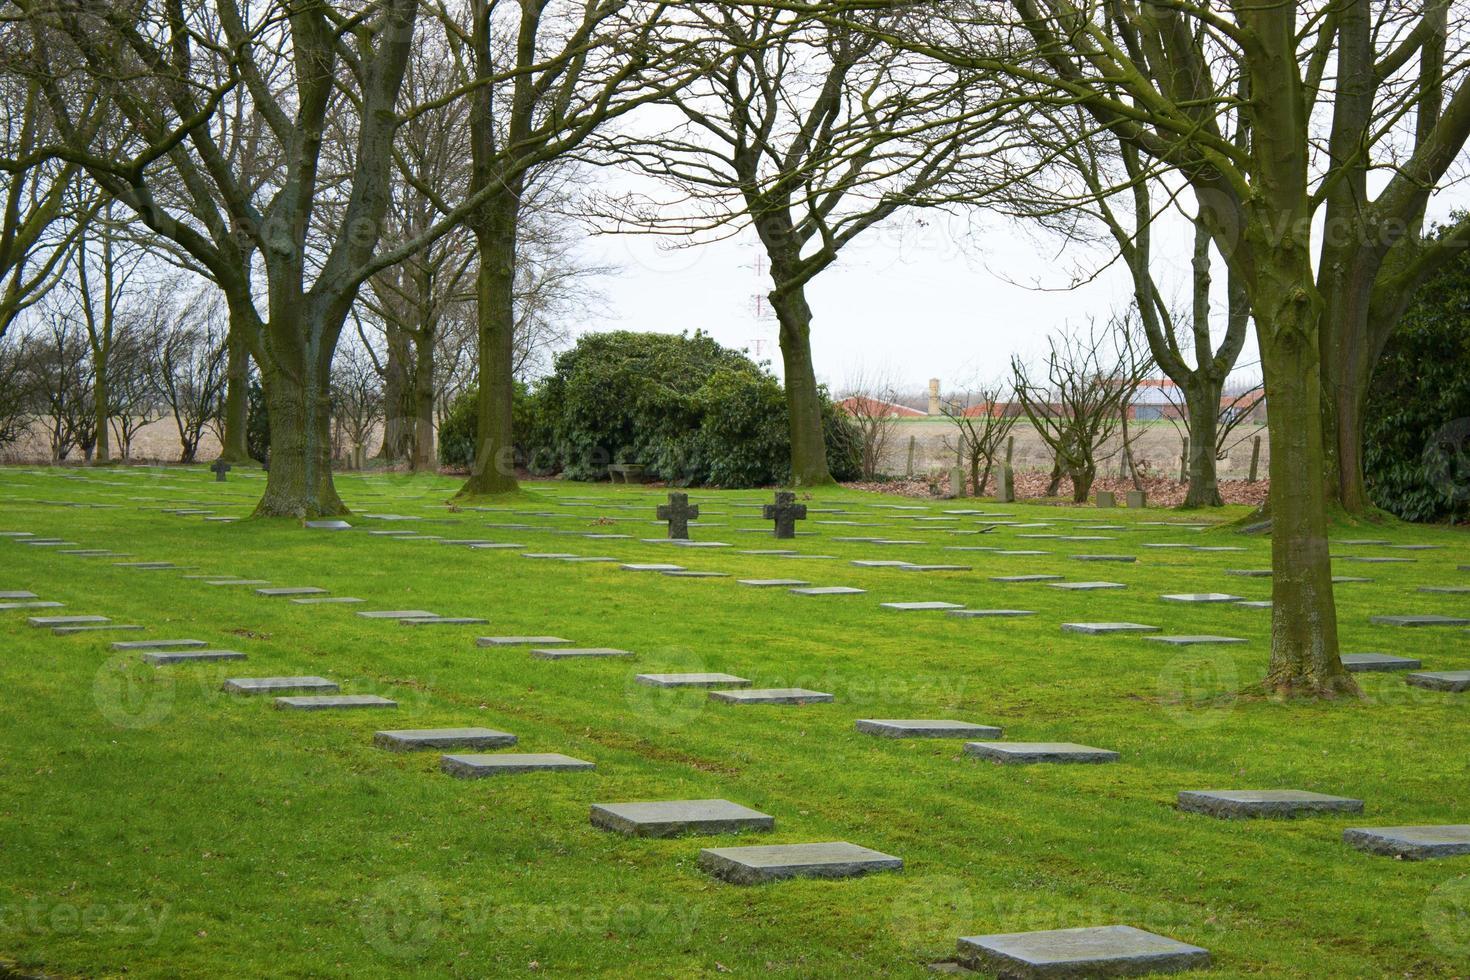 Gran guerra mundial alemana 1 campos de Flandes cementerio de Bélgica foto